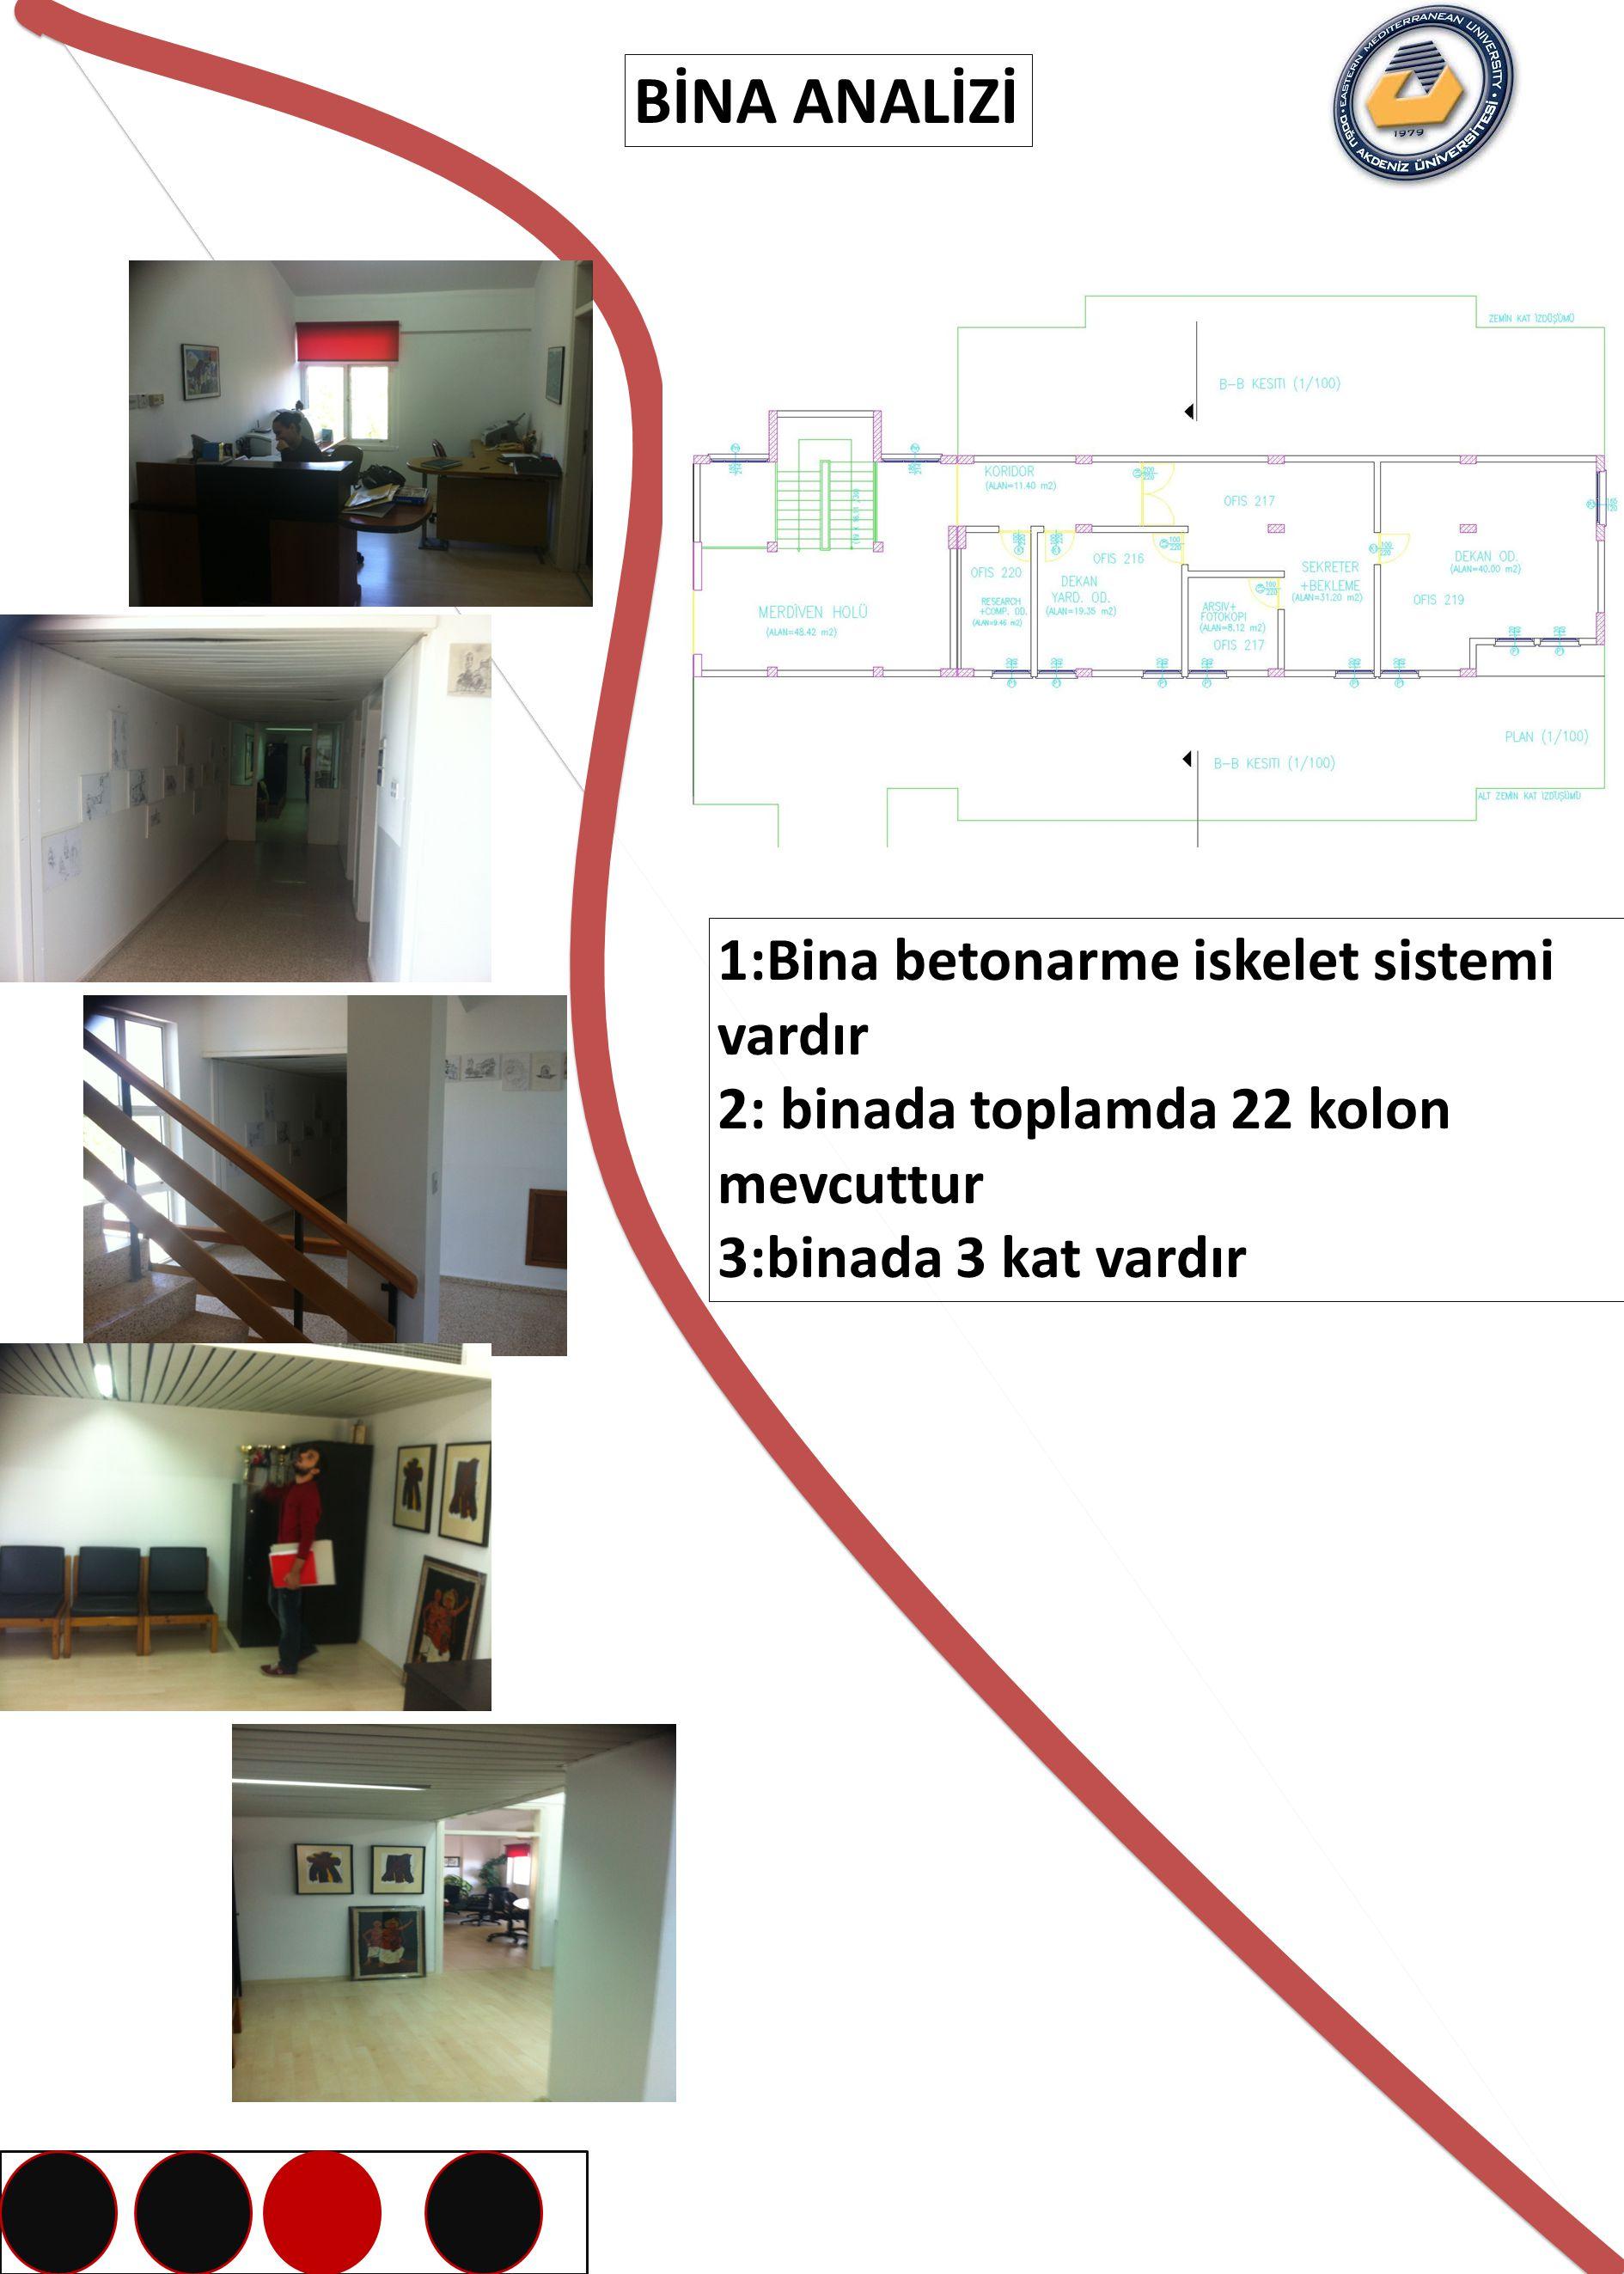 BİNA ANALİZİ 1:Bina betonarme iskelet sistemi vardır